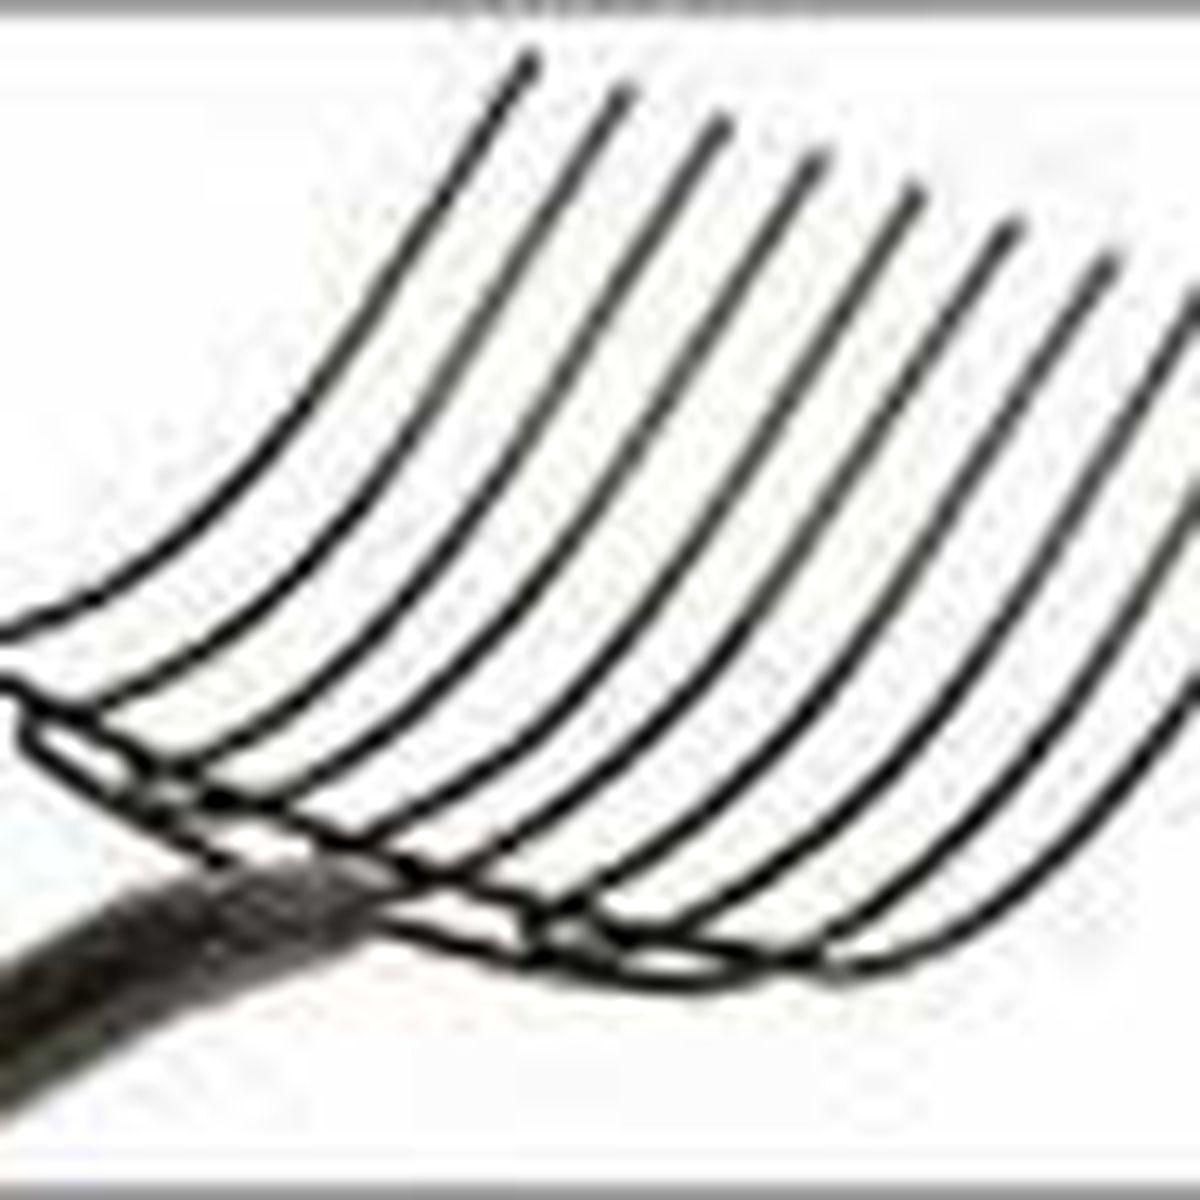 mulch fork